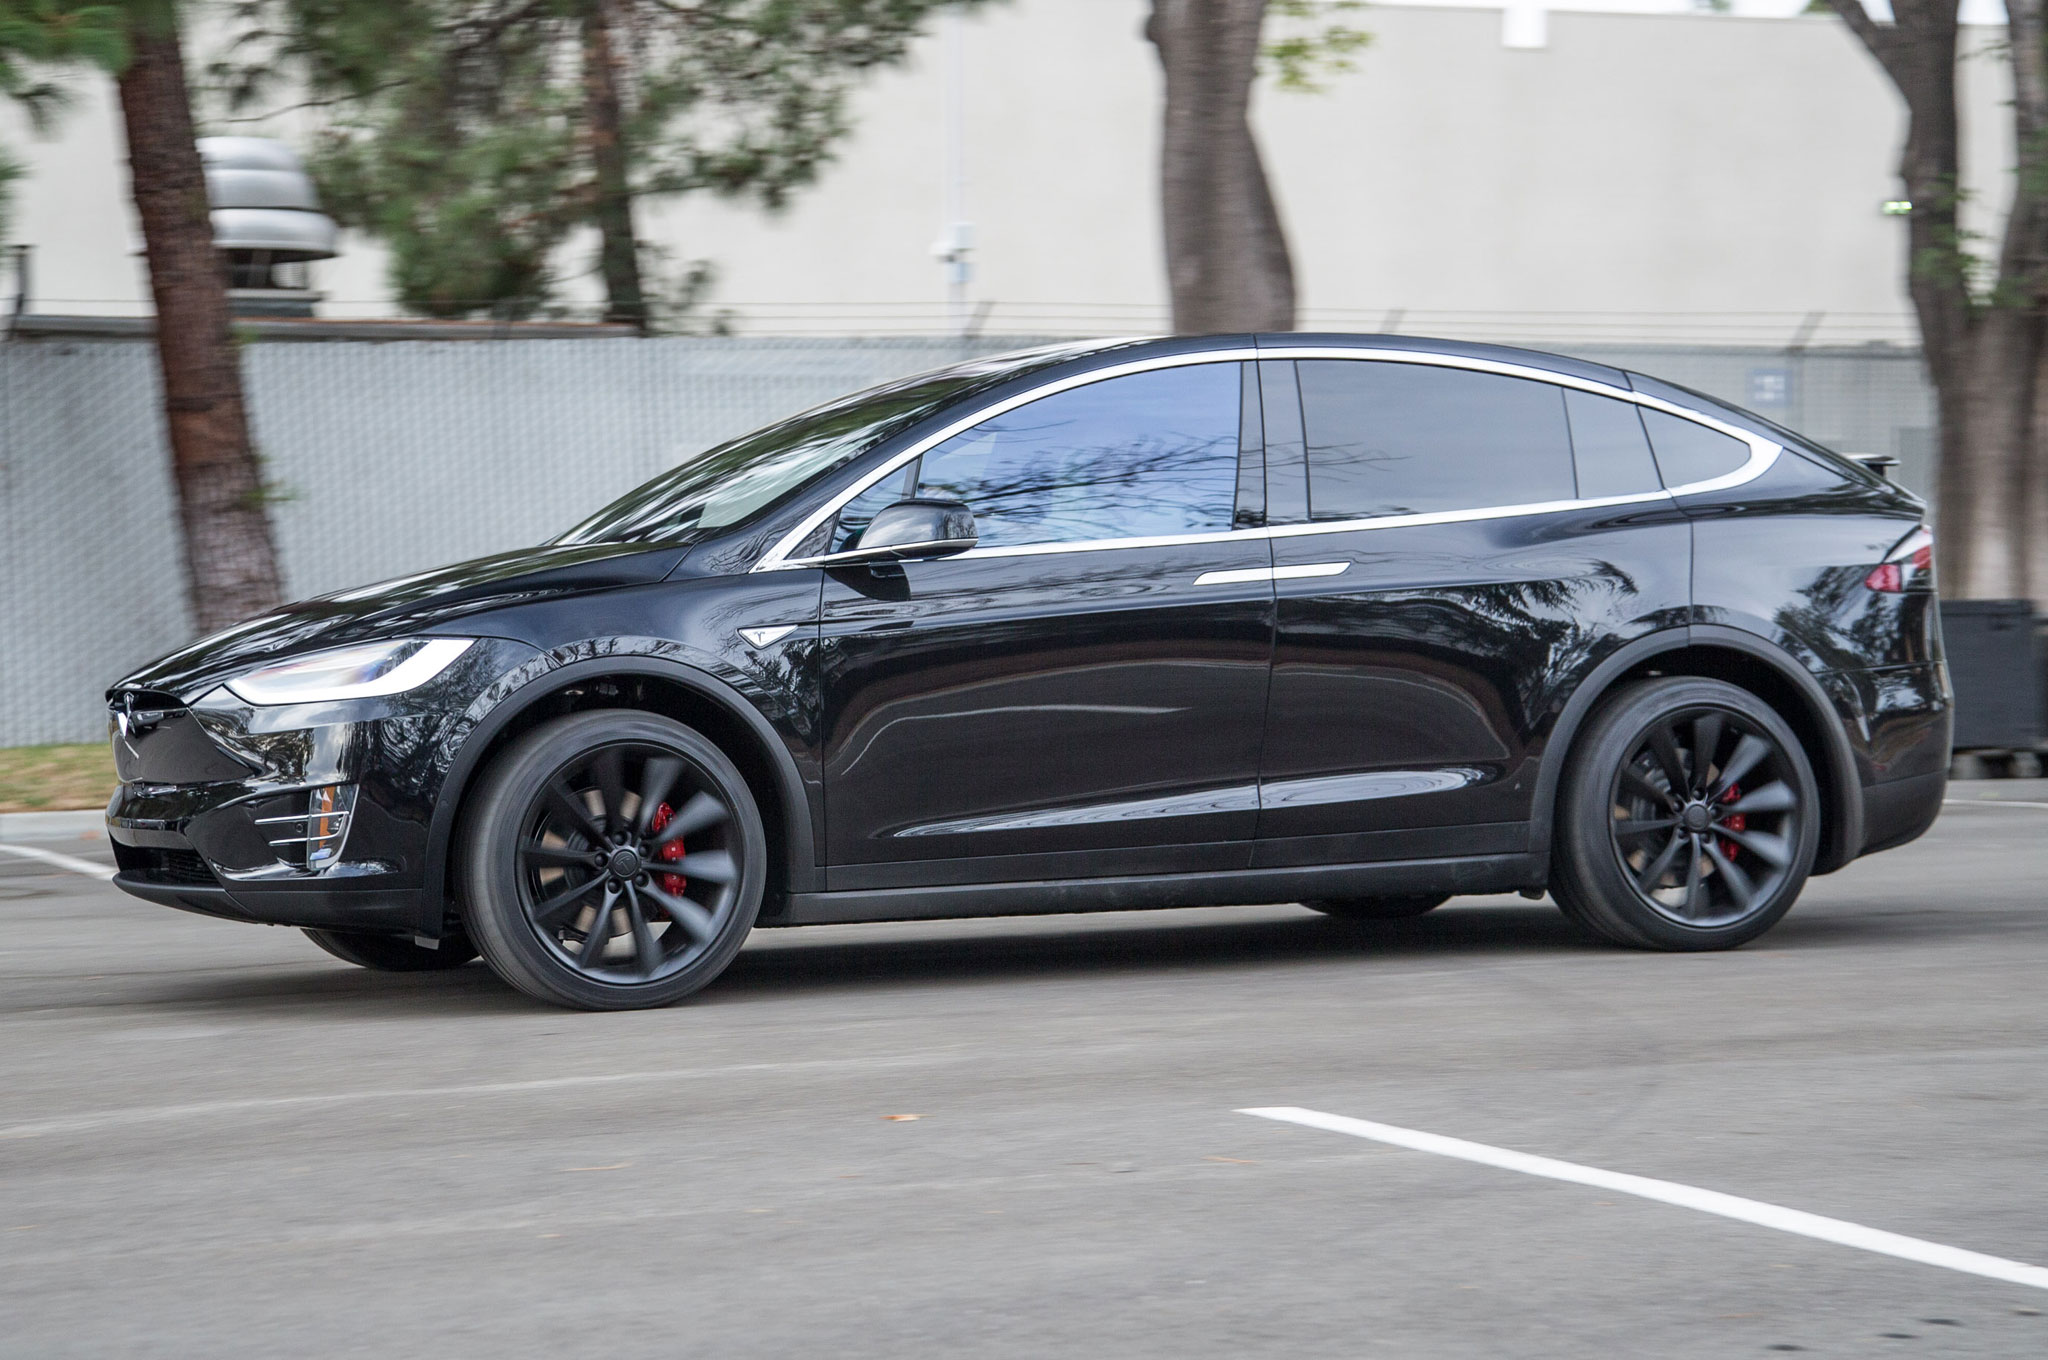 2016-Tesla-Model-X-side-motion-view